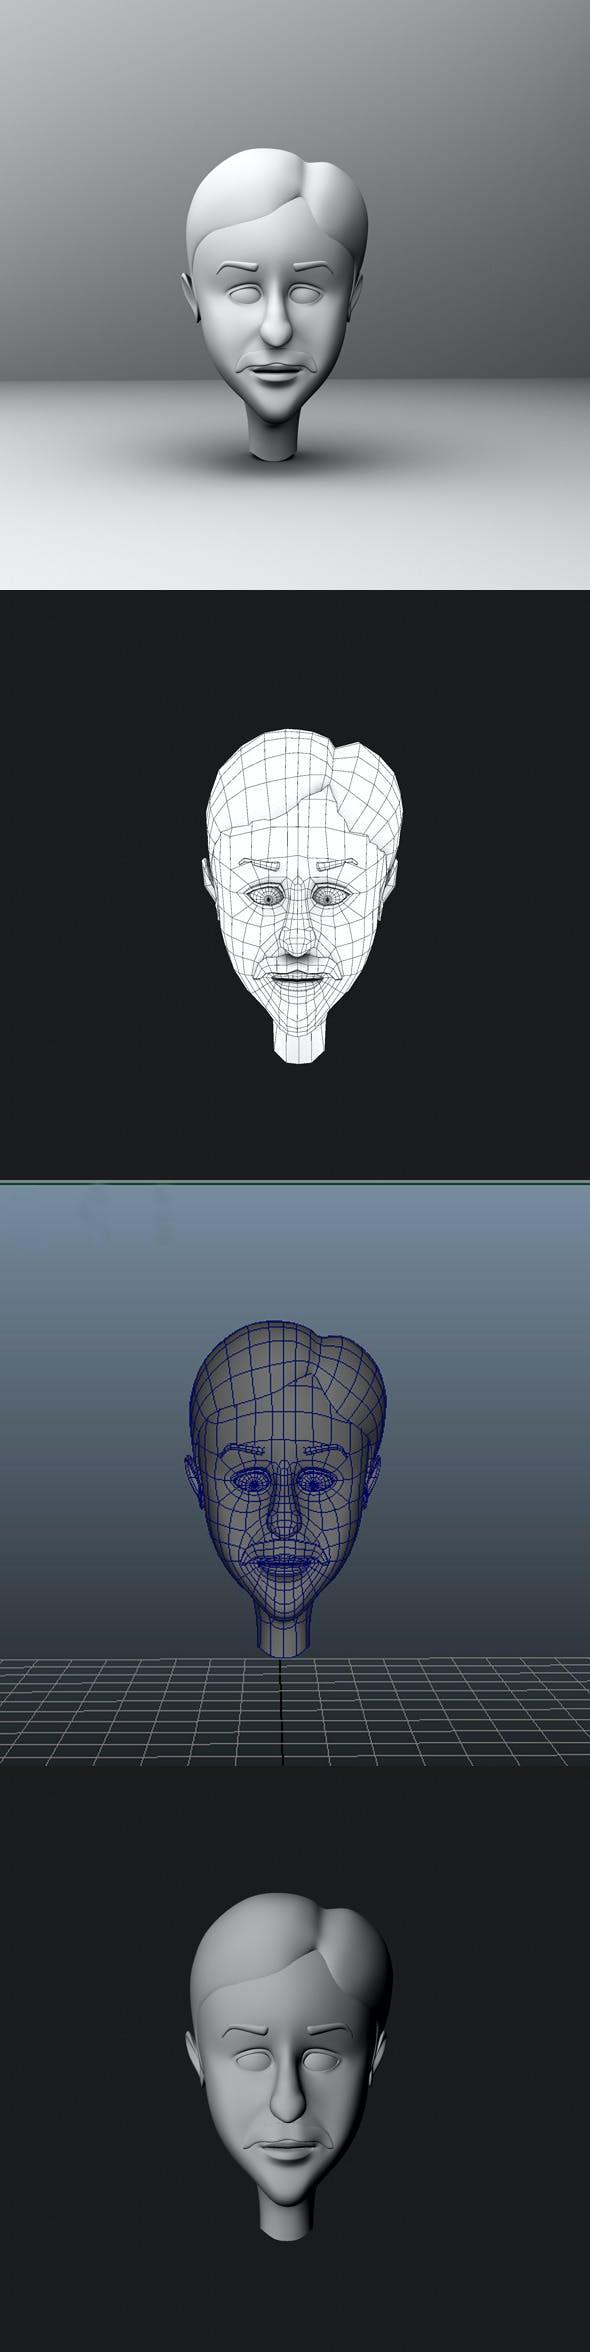 Base Mesh Cartoon Character  Head - 3DOcean Item for Sale